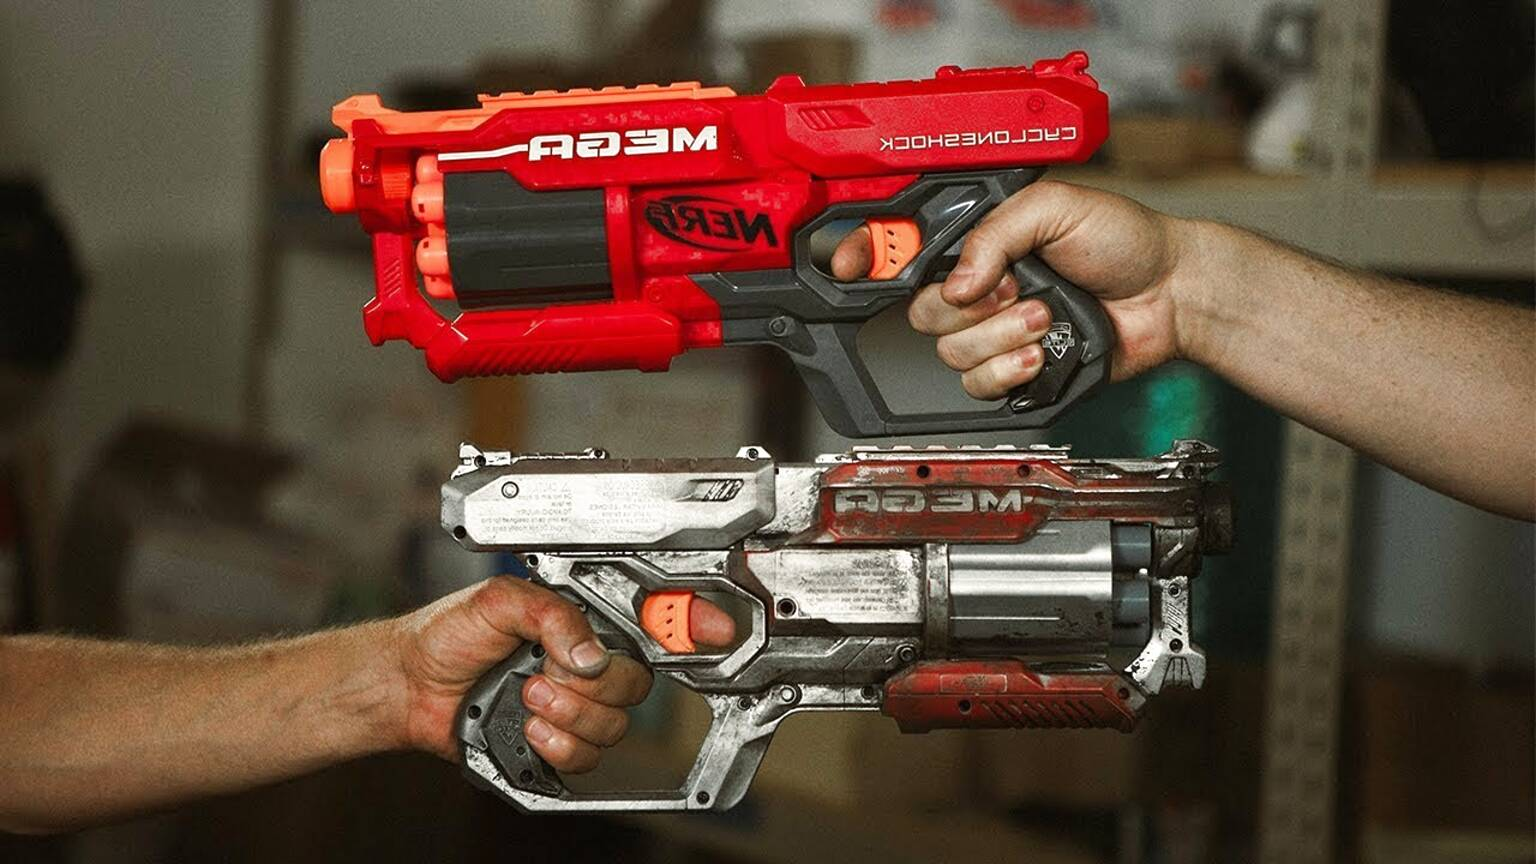 nerf gun mod for sale